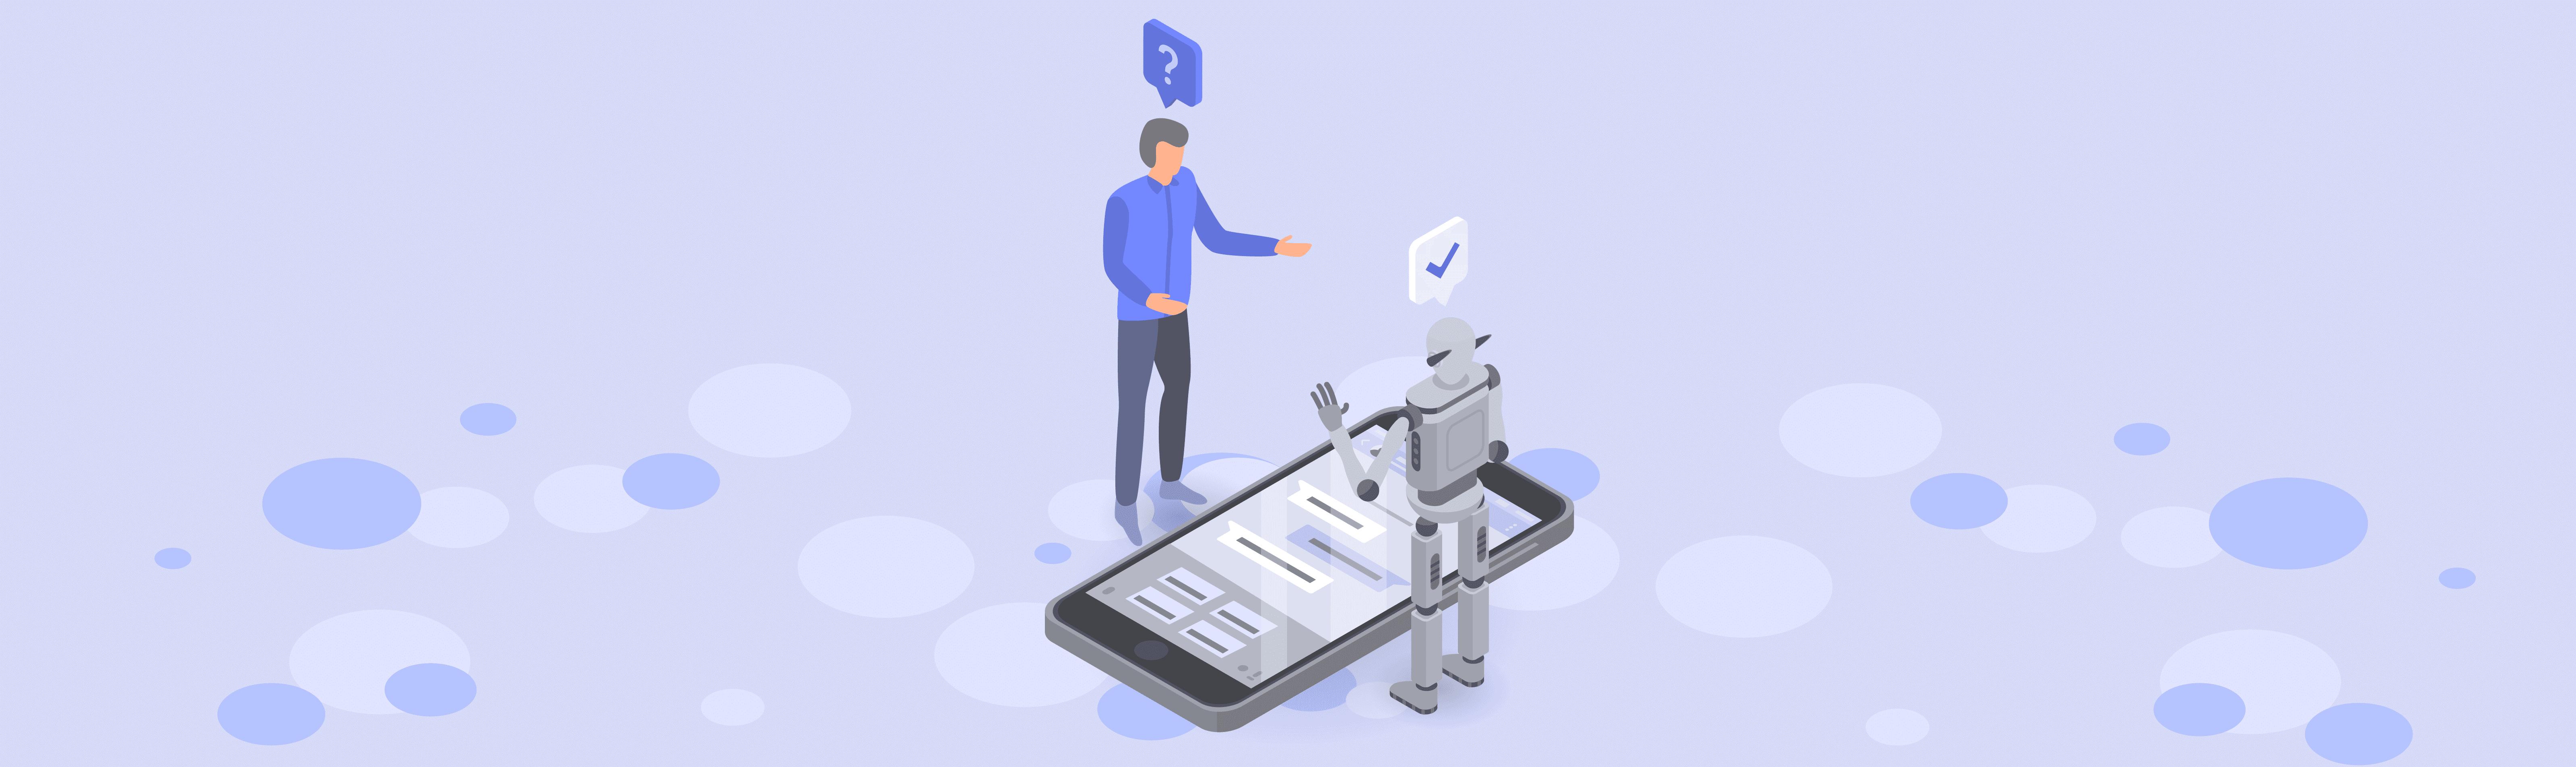 Menu-Driven Chatbot